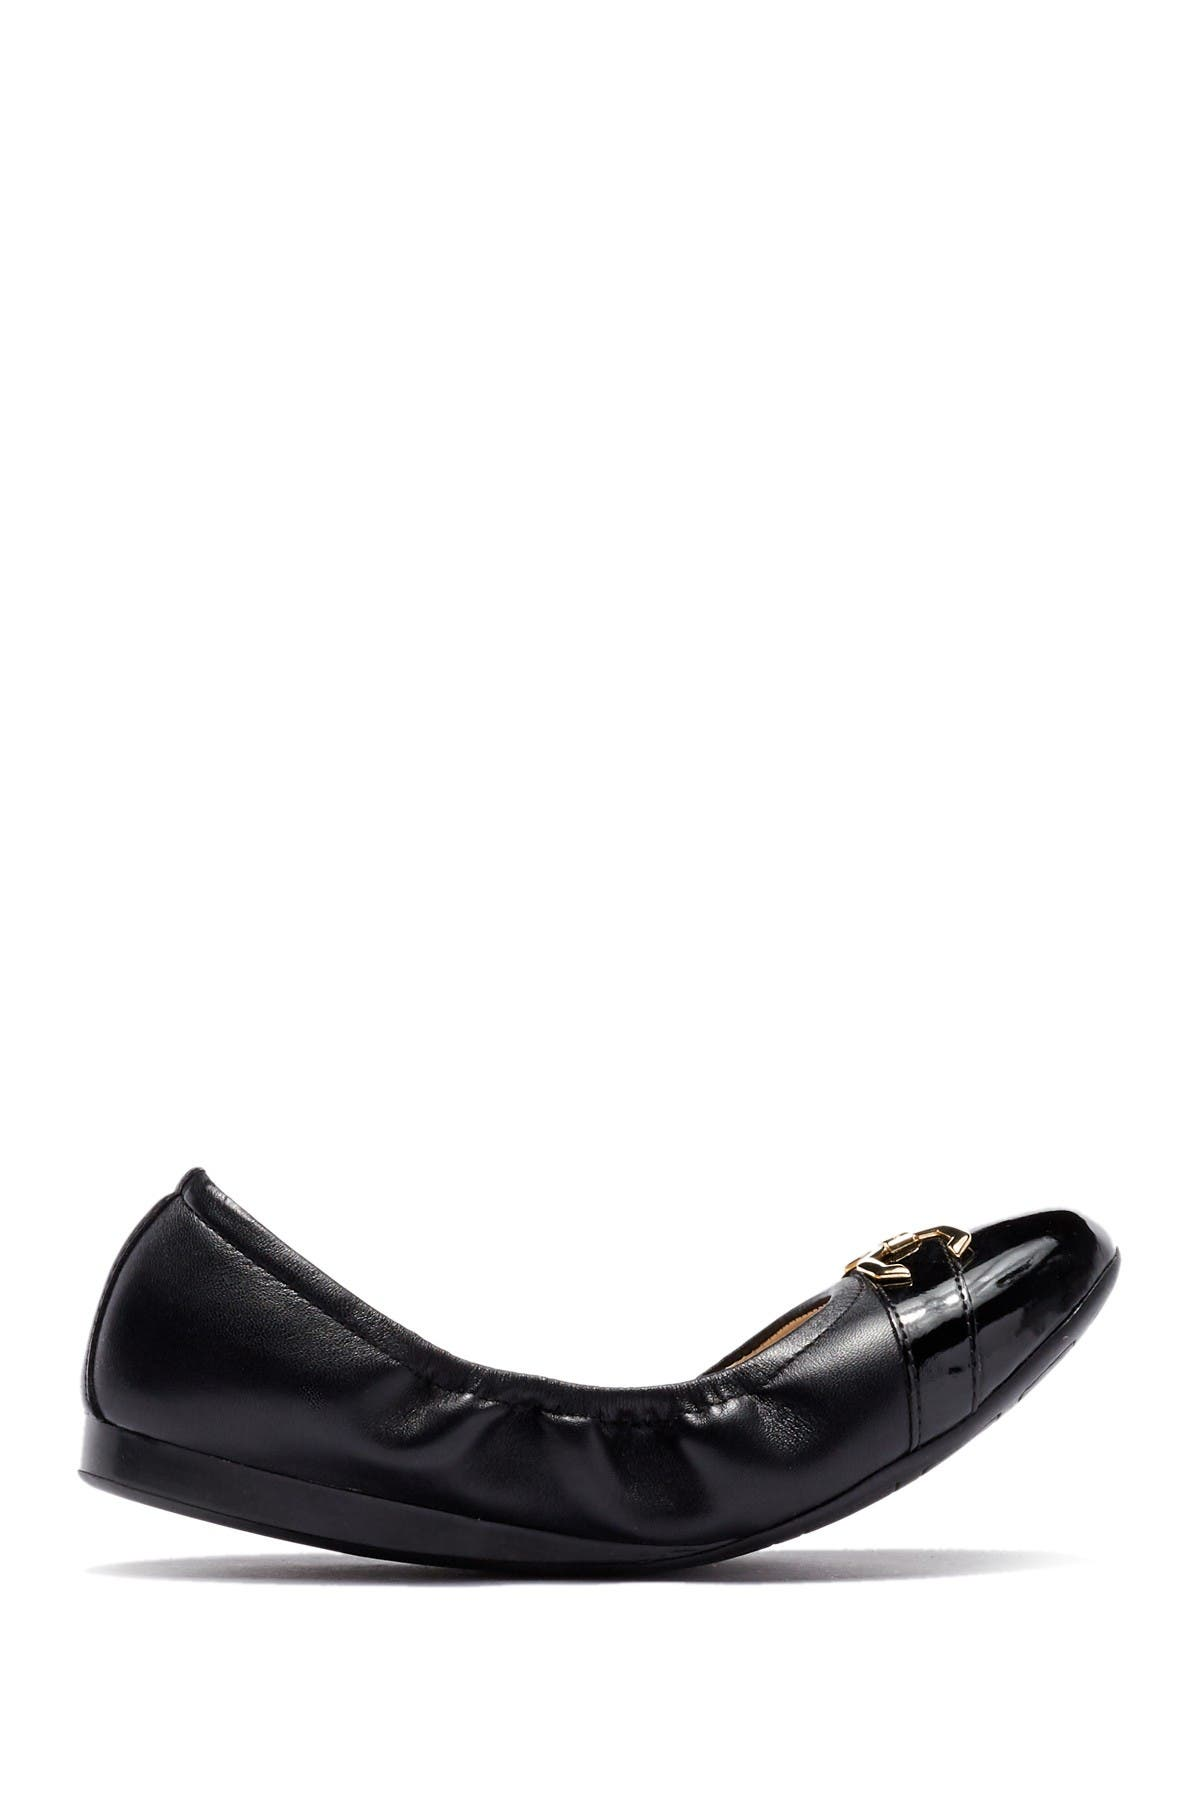 Cole Haan | Terrin Leather Ballet Flat